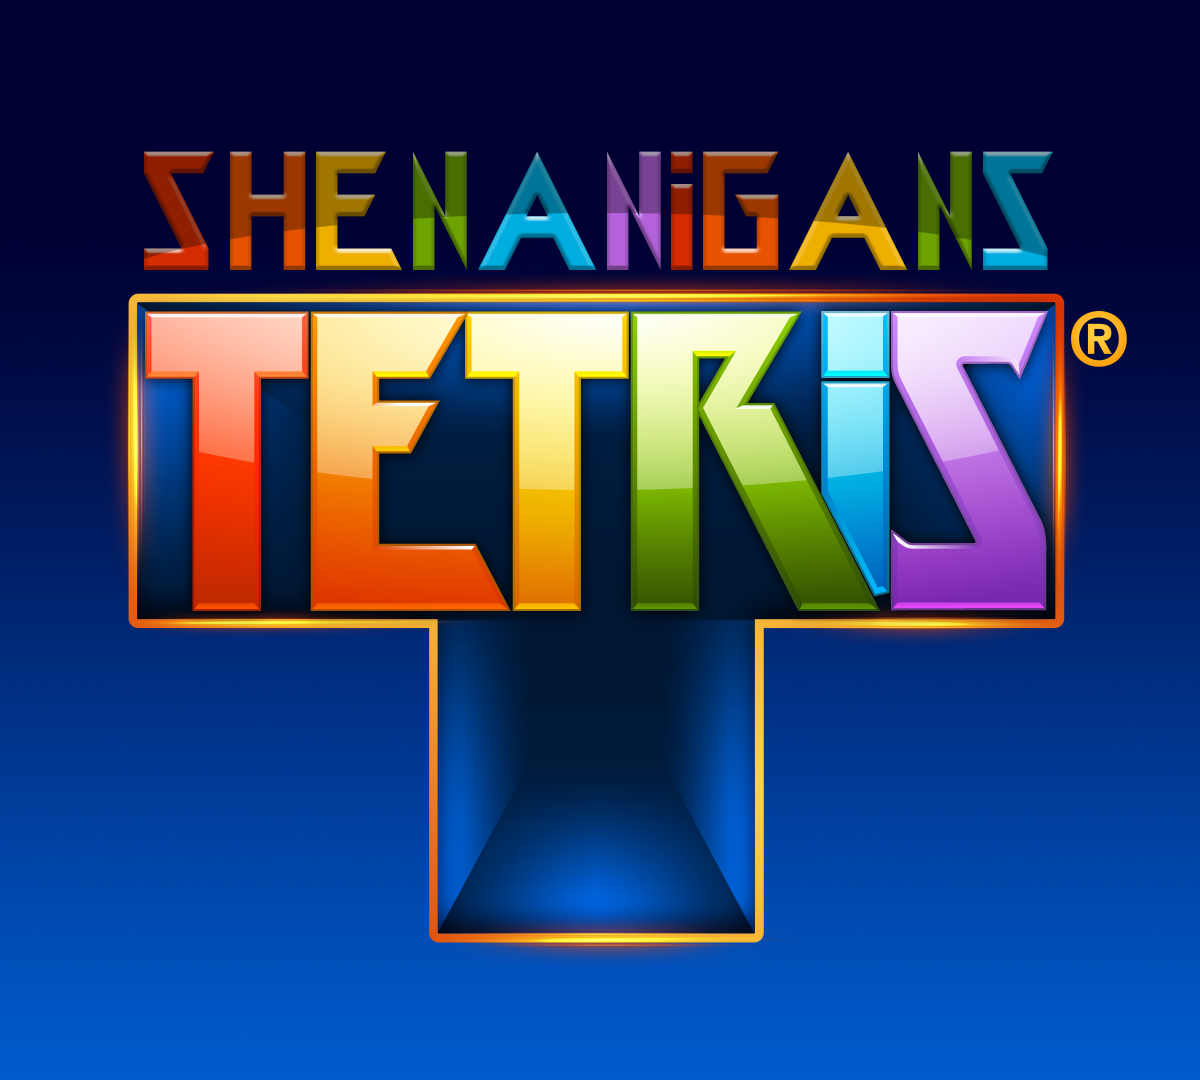 Tetris Shenanigans FONDO